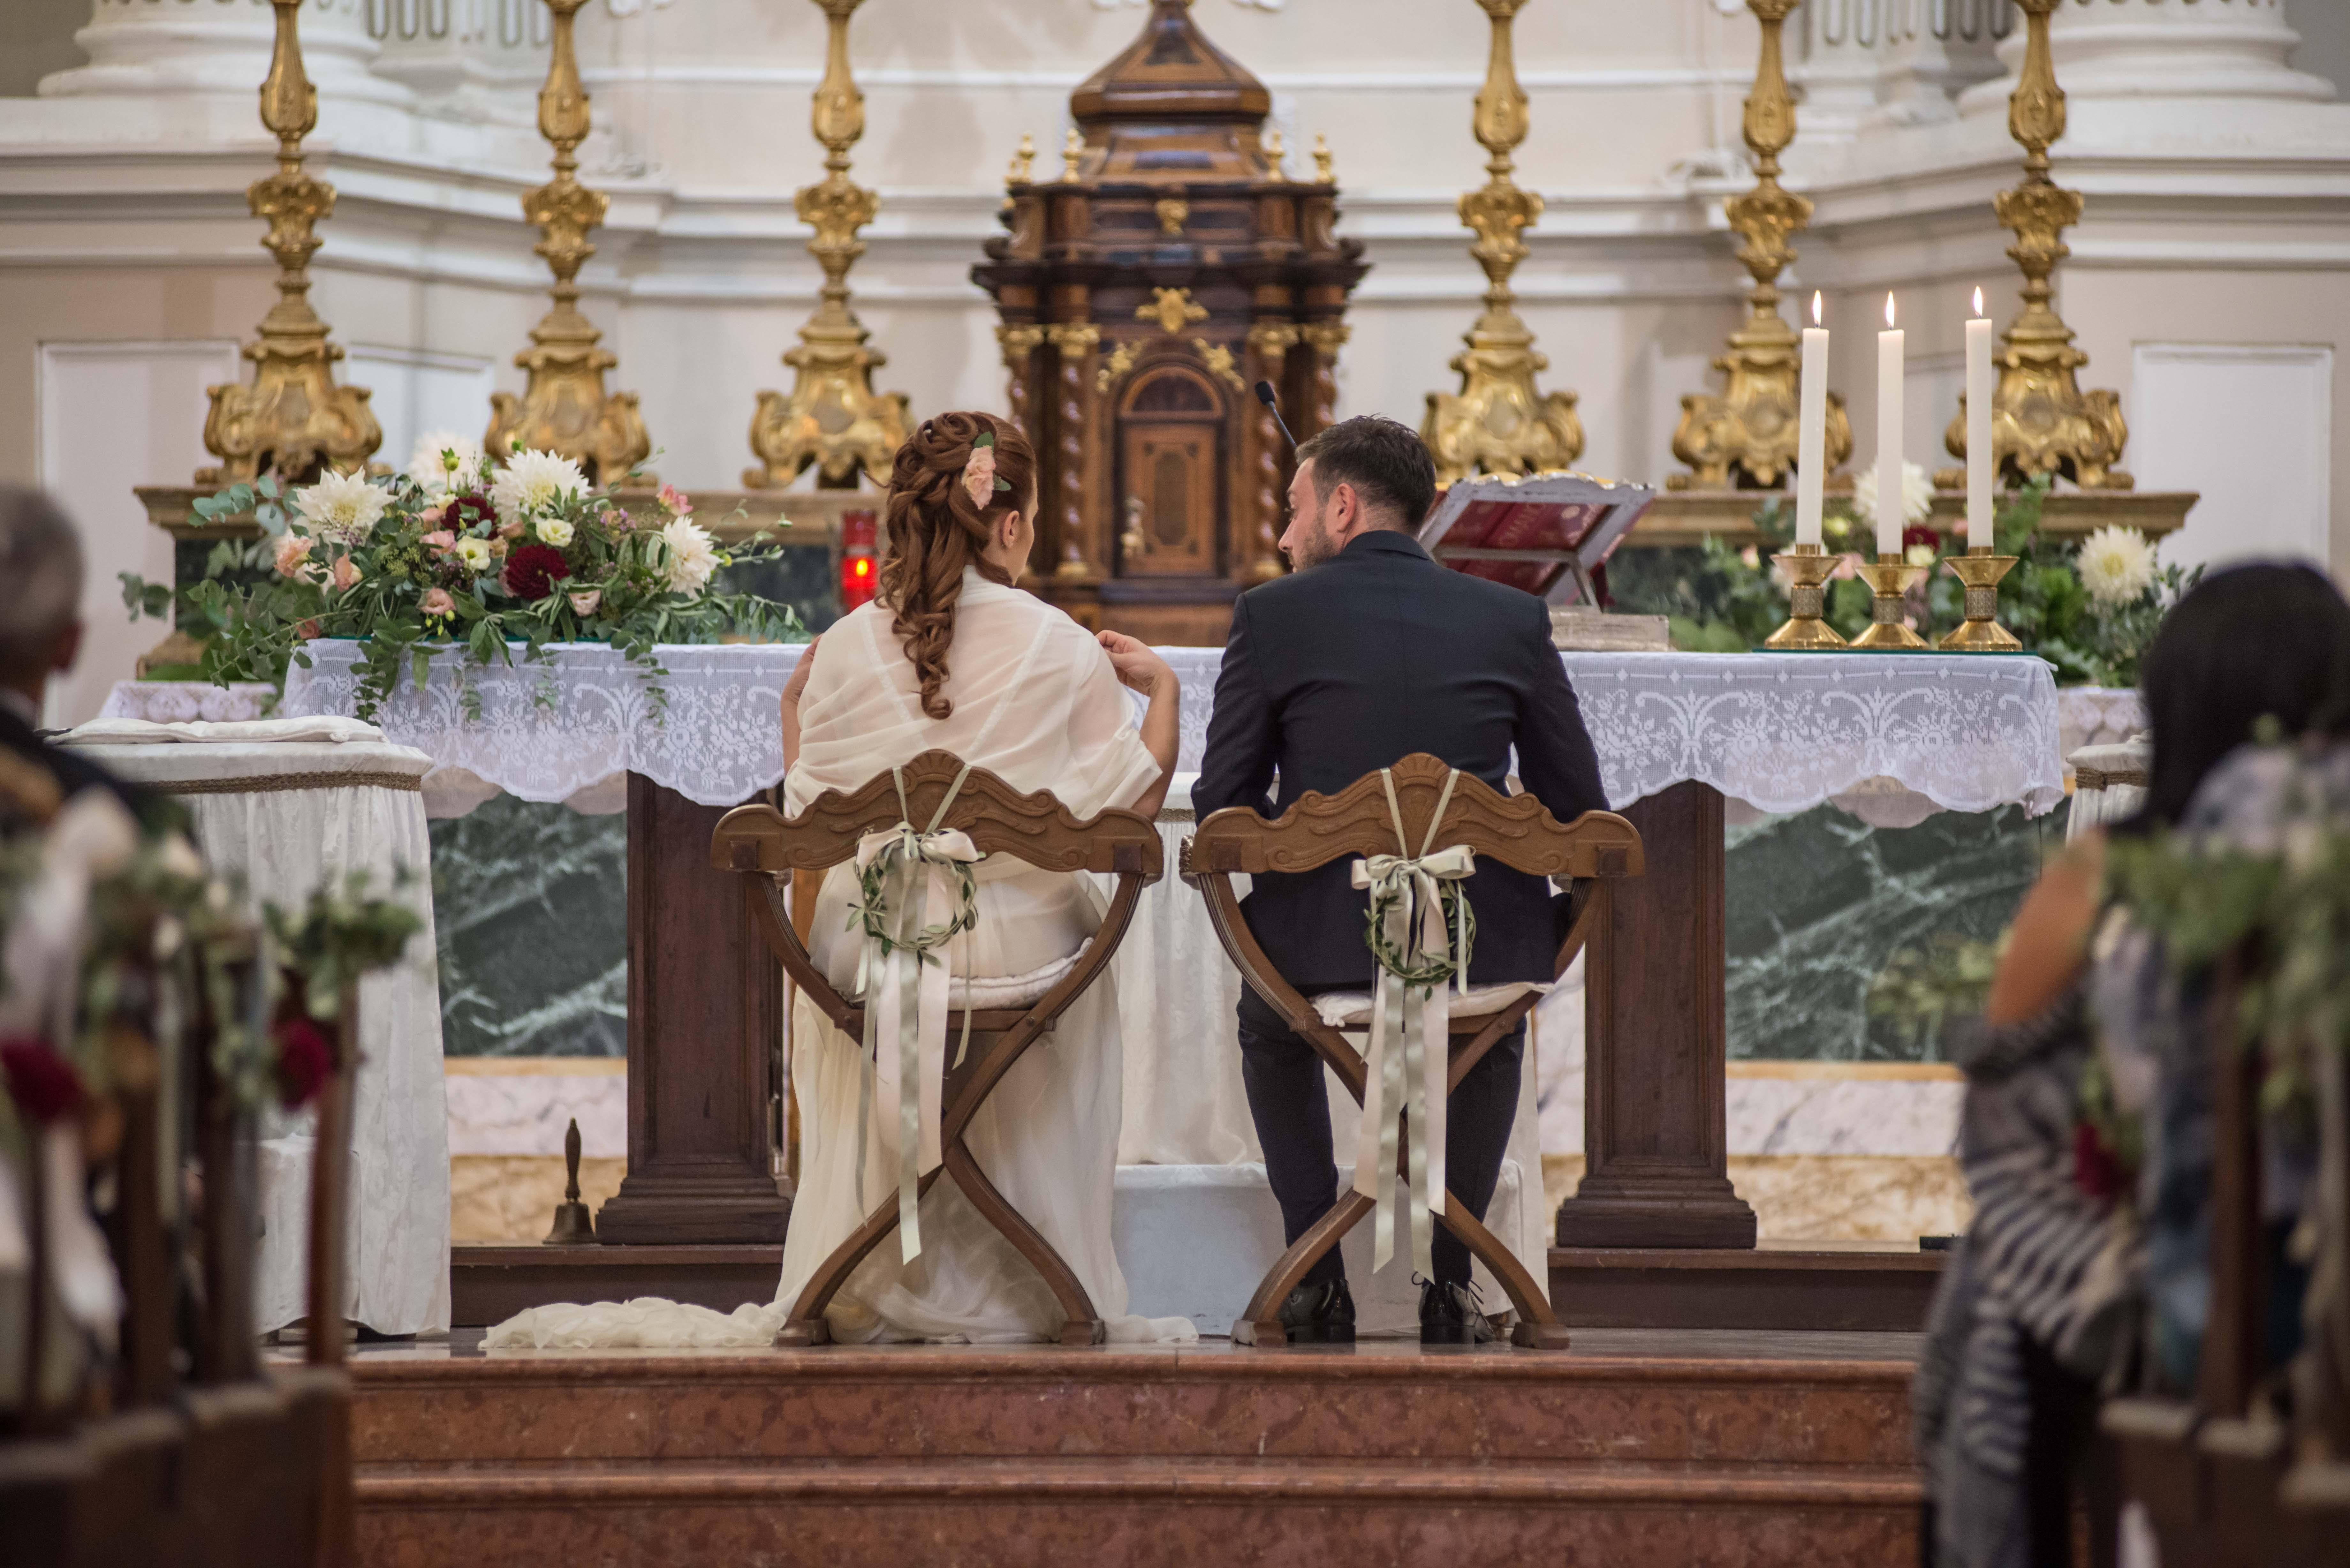 Matrimonio Tema Ulivo : Matrimonio wedding tema ulivo laweddingintasca la